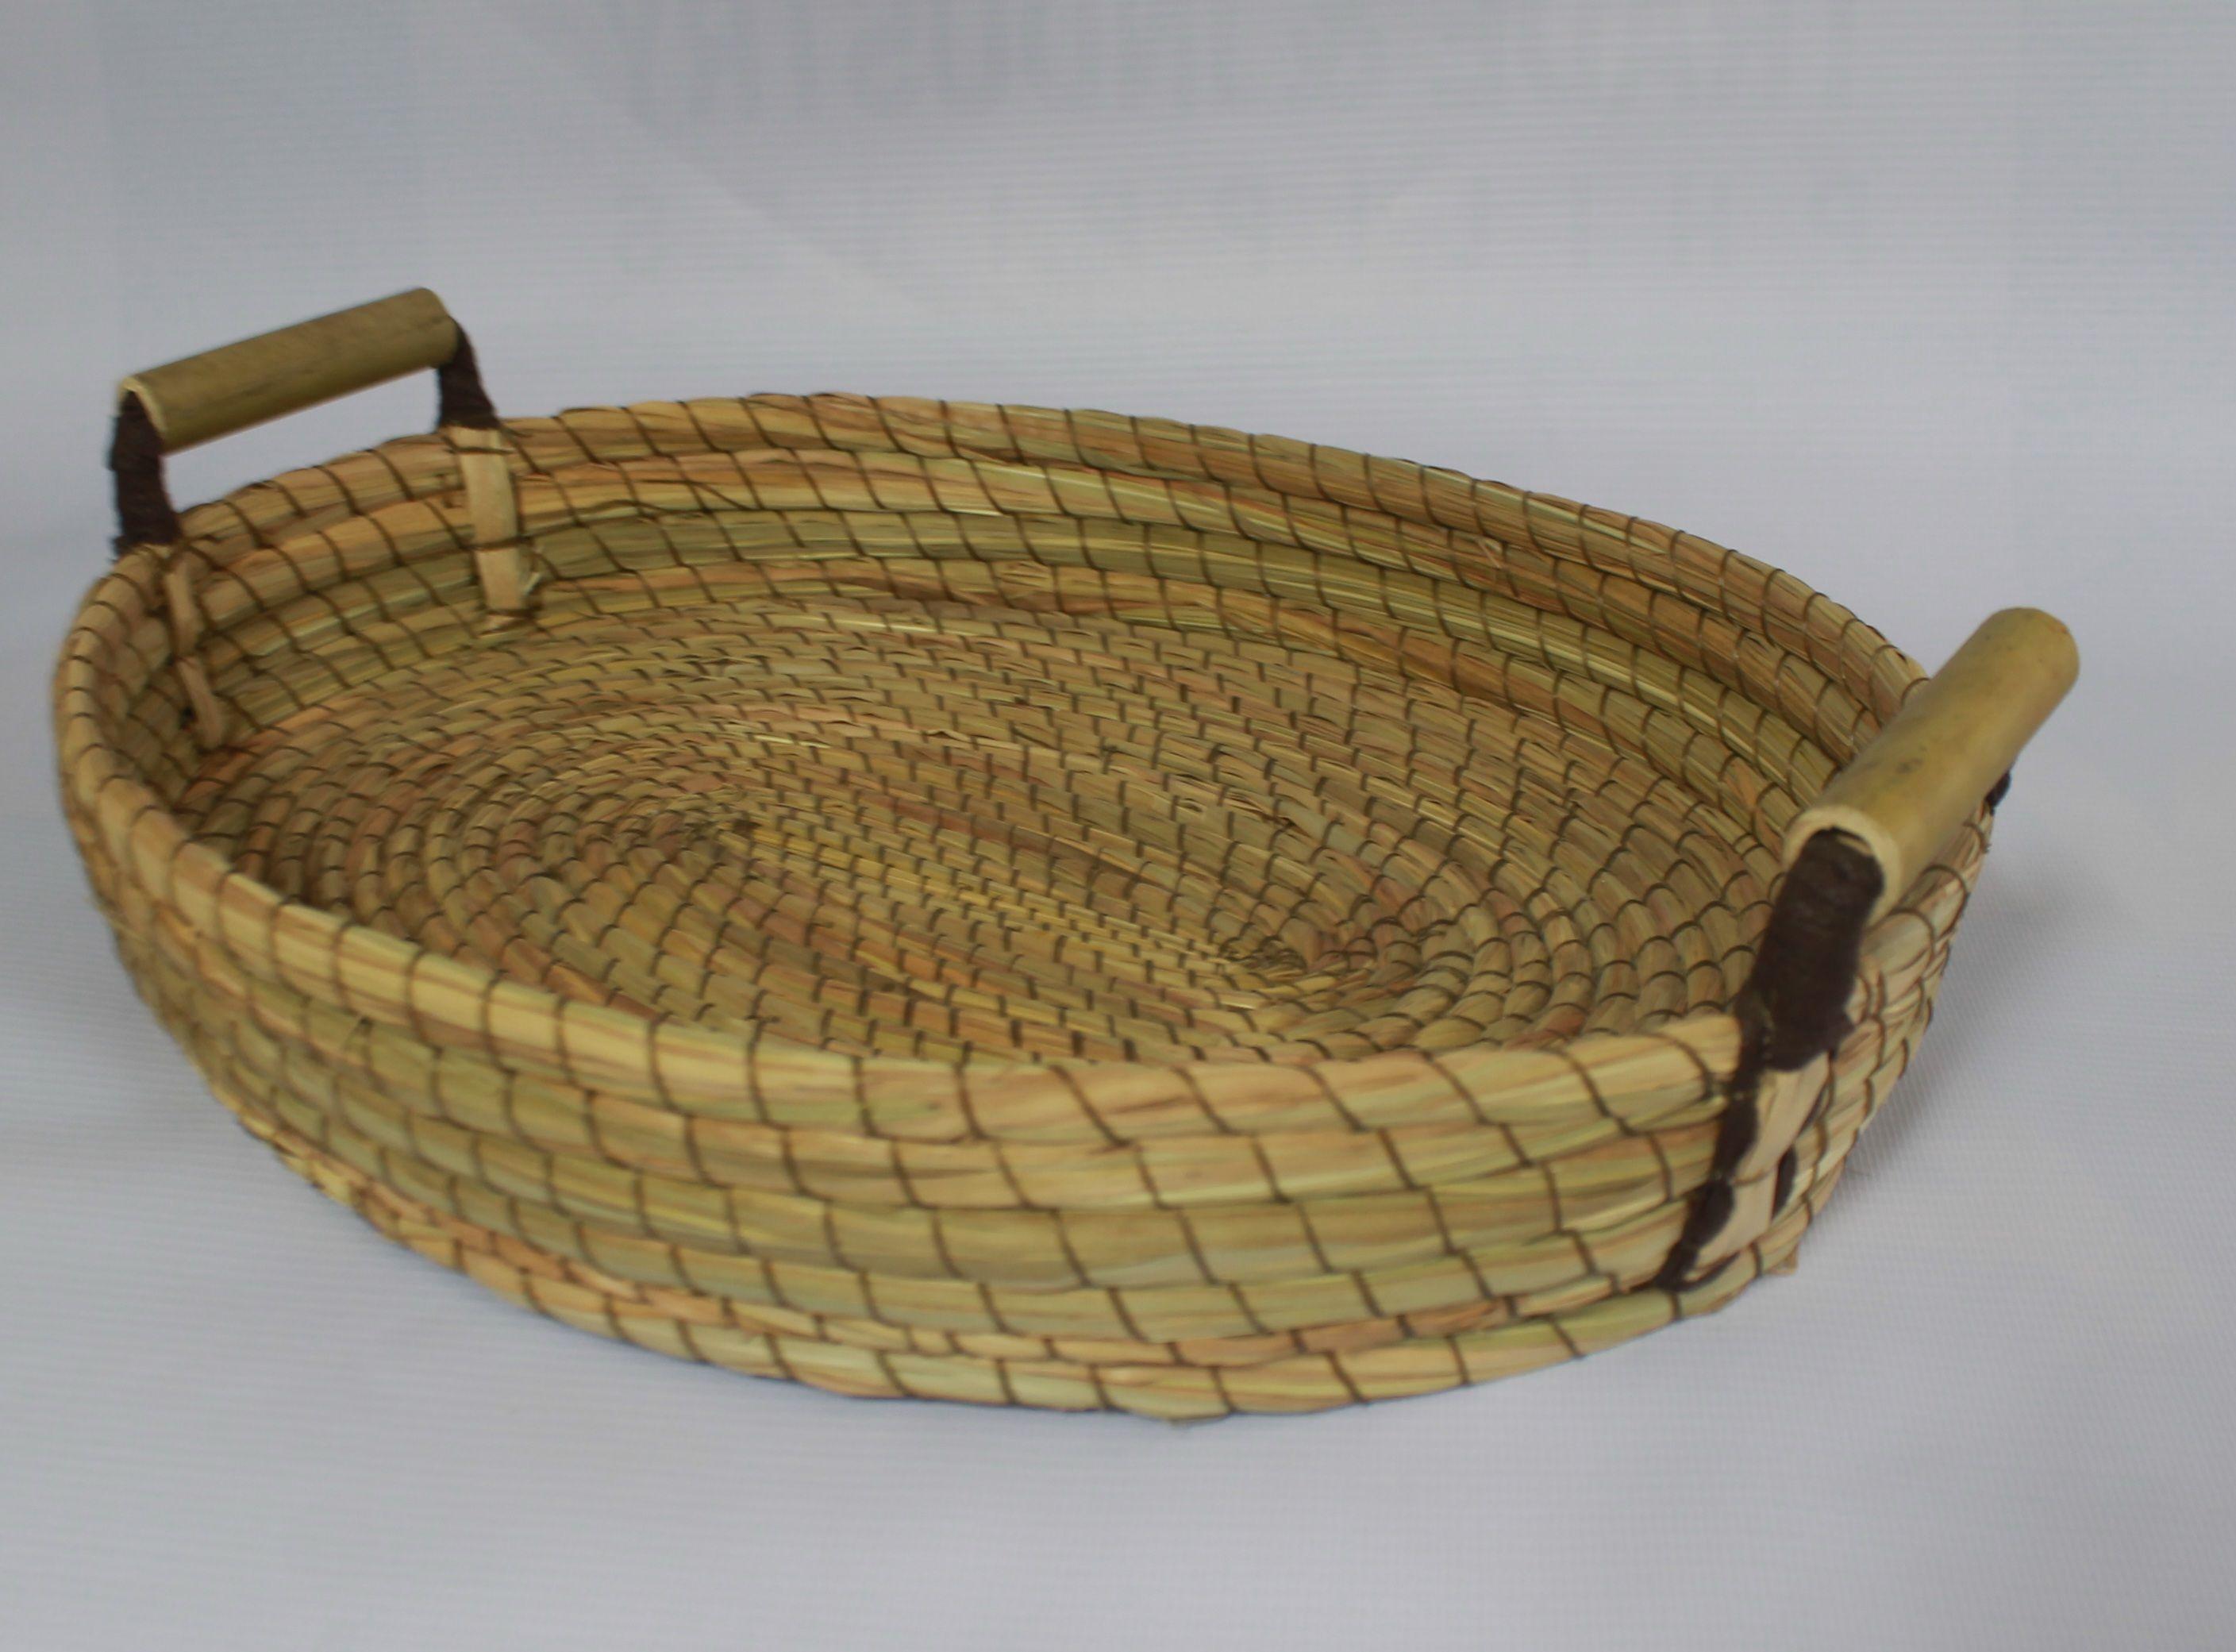 Oval Tray Wicker Laundry Basket Oval Tray Laundry Basket